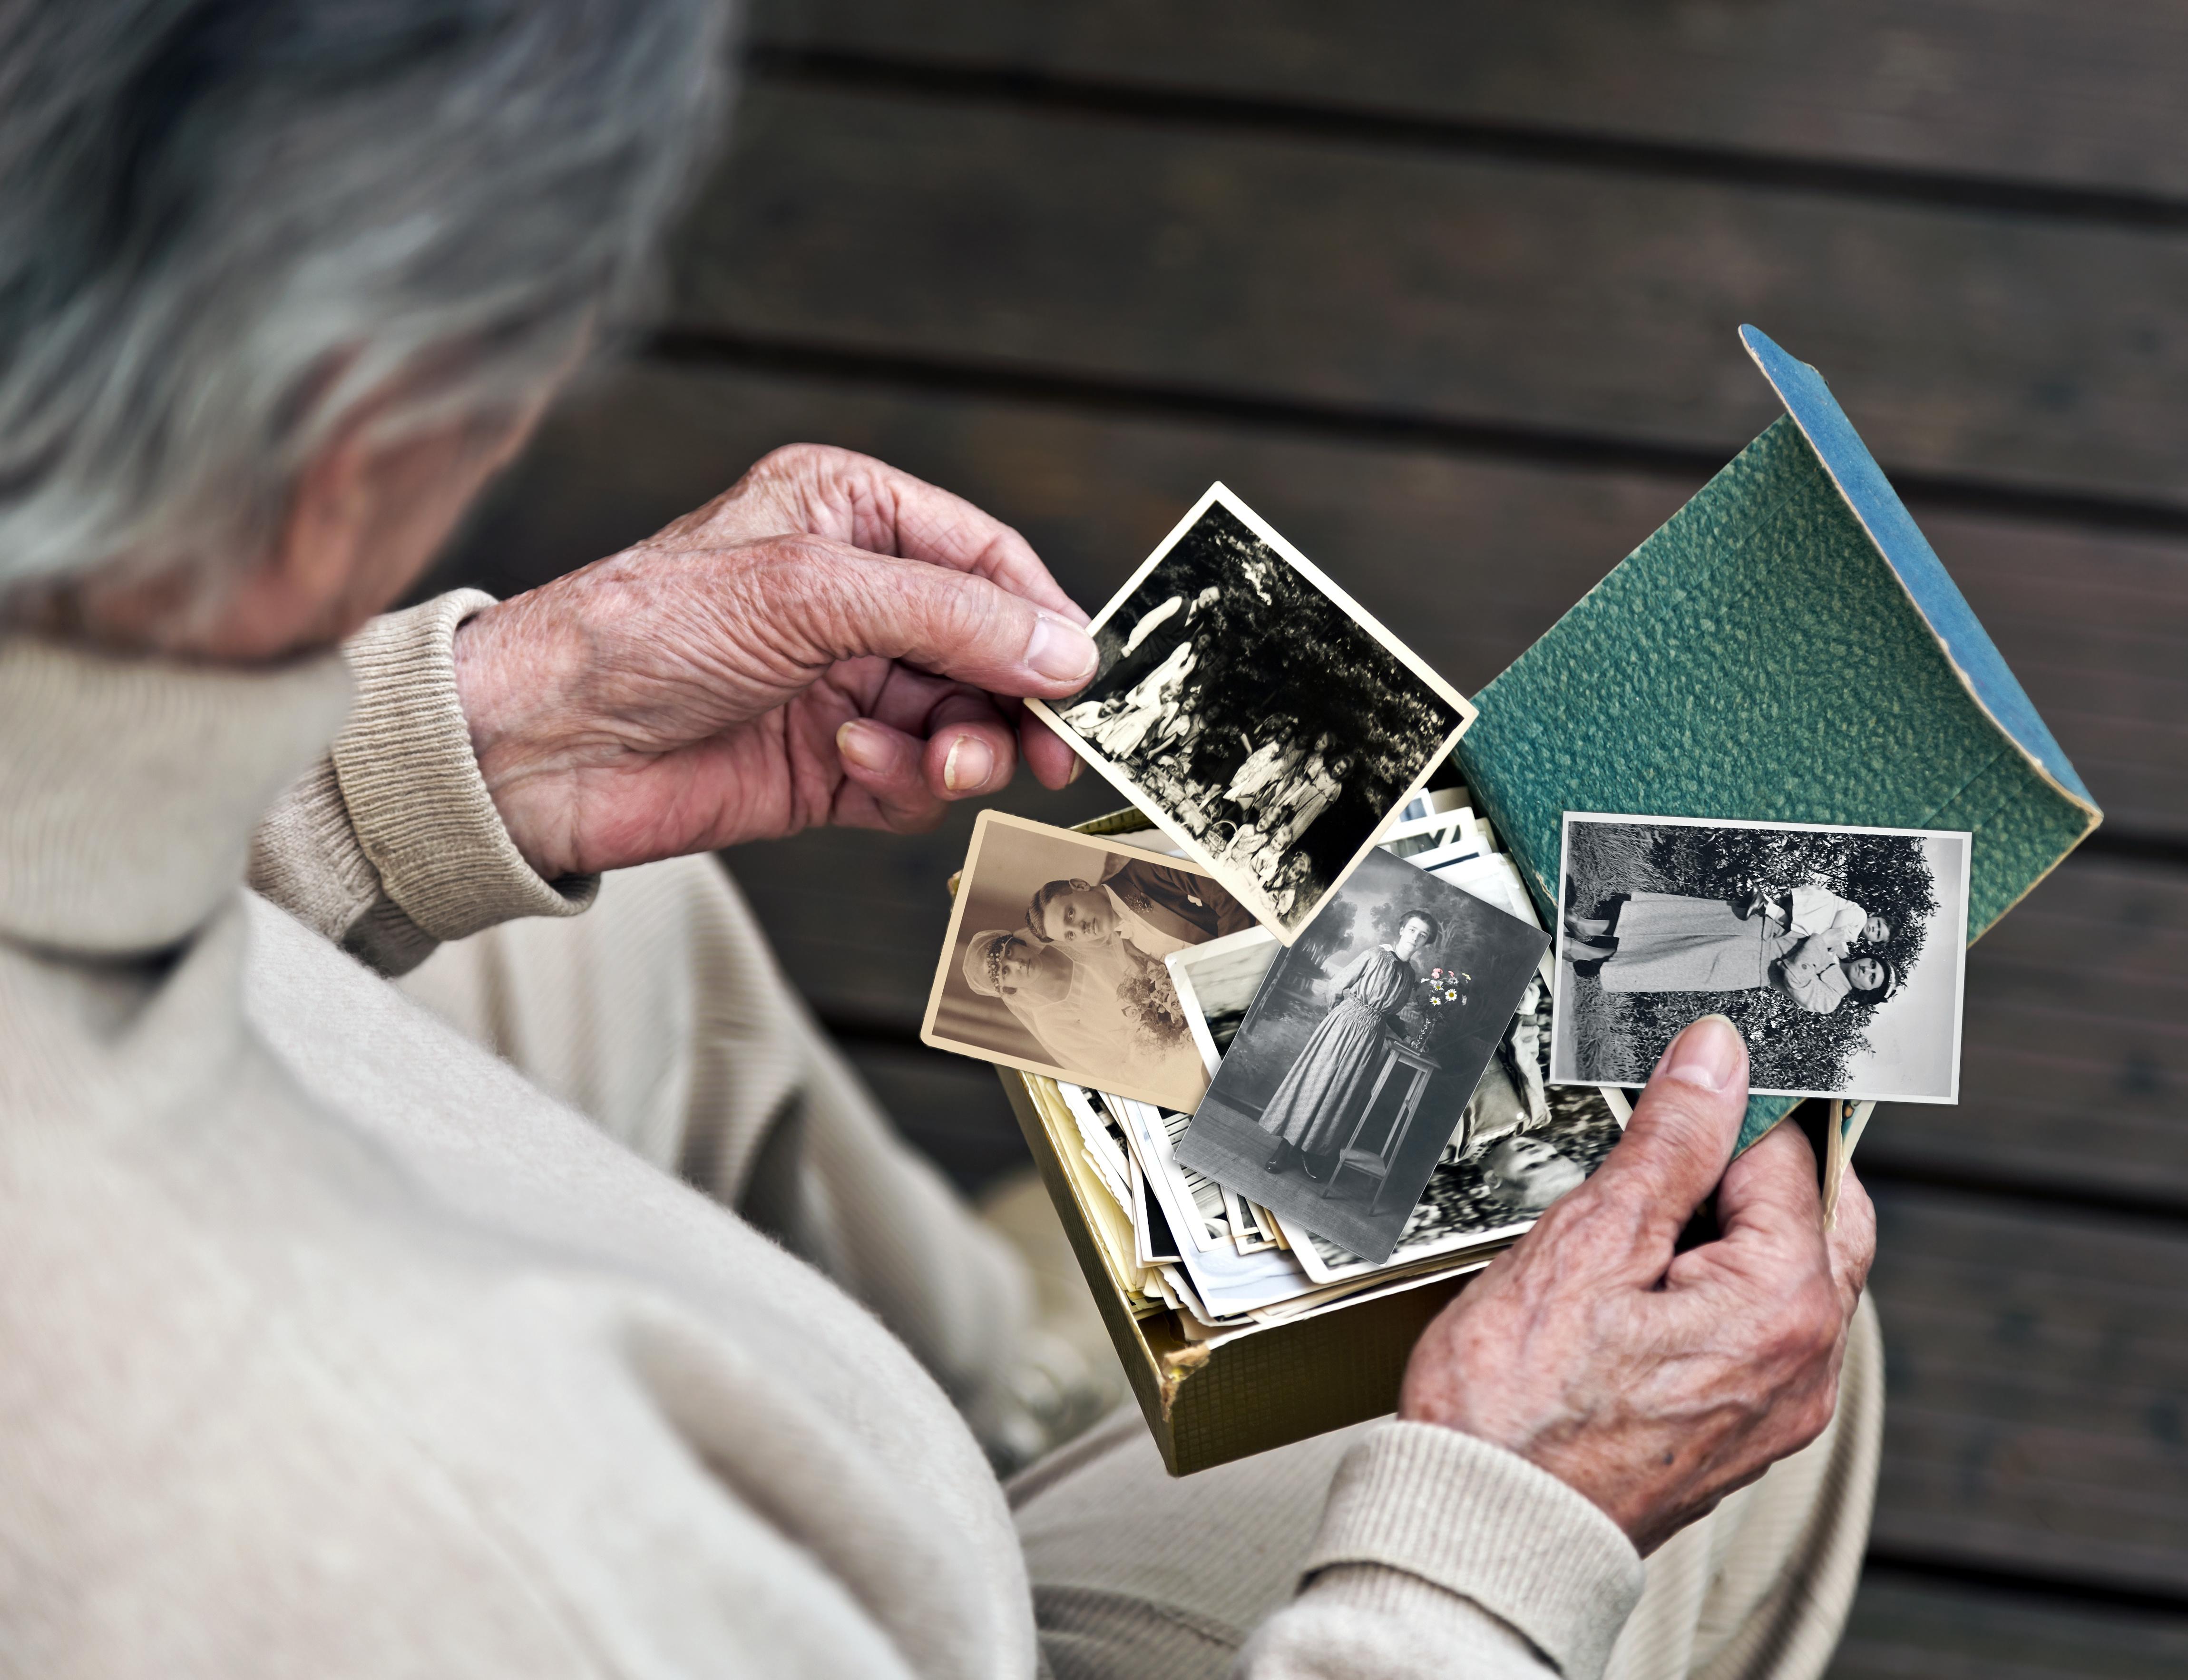 Erinnerung – Demenz – Alt – Vergangenheit